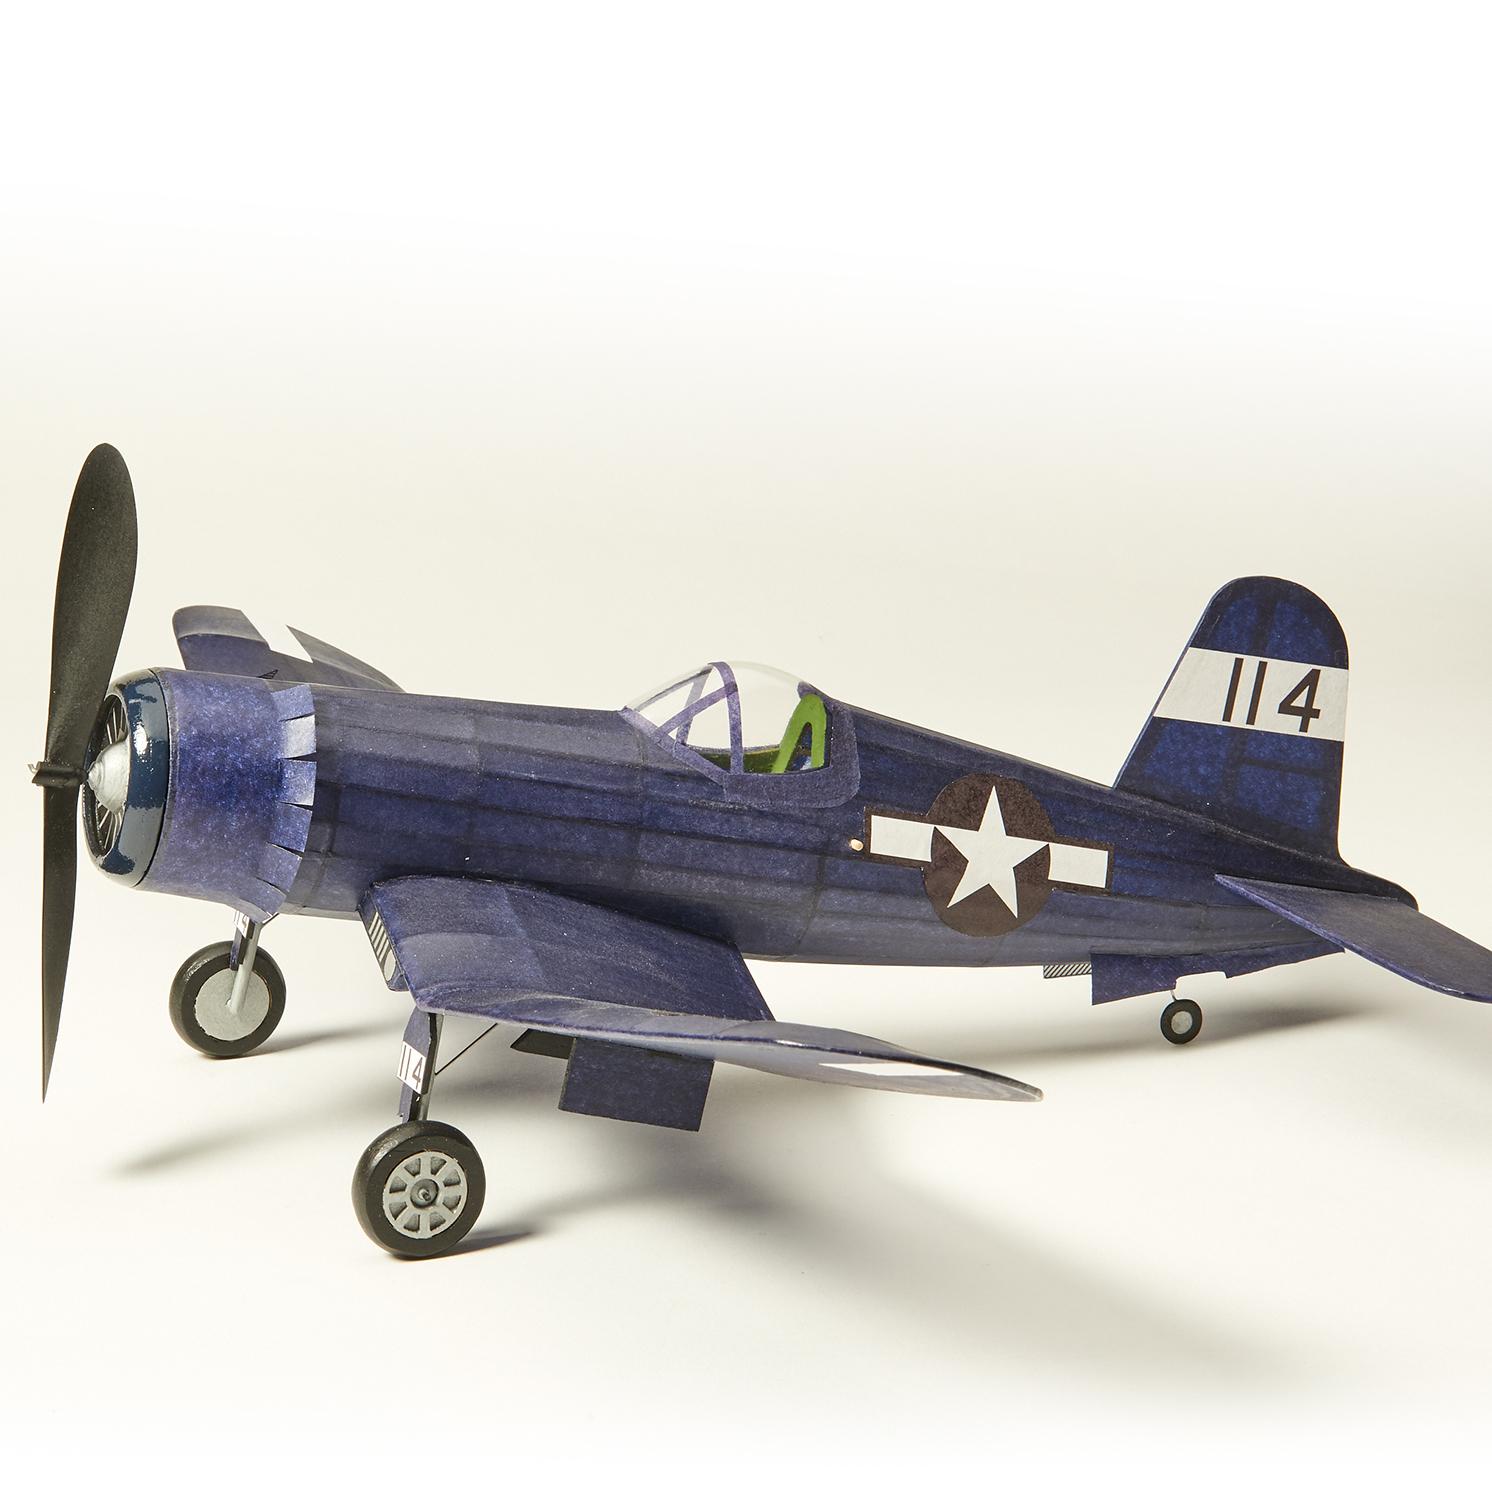 The Vintage Model Company – Vought F4U Corsair Balsa Wood Kit